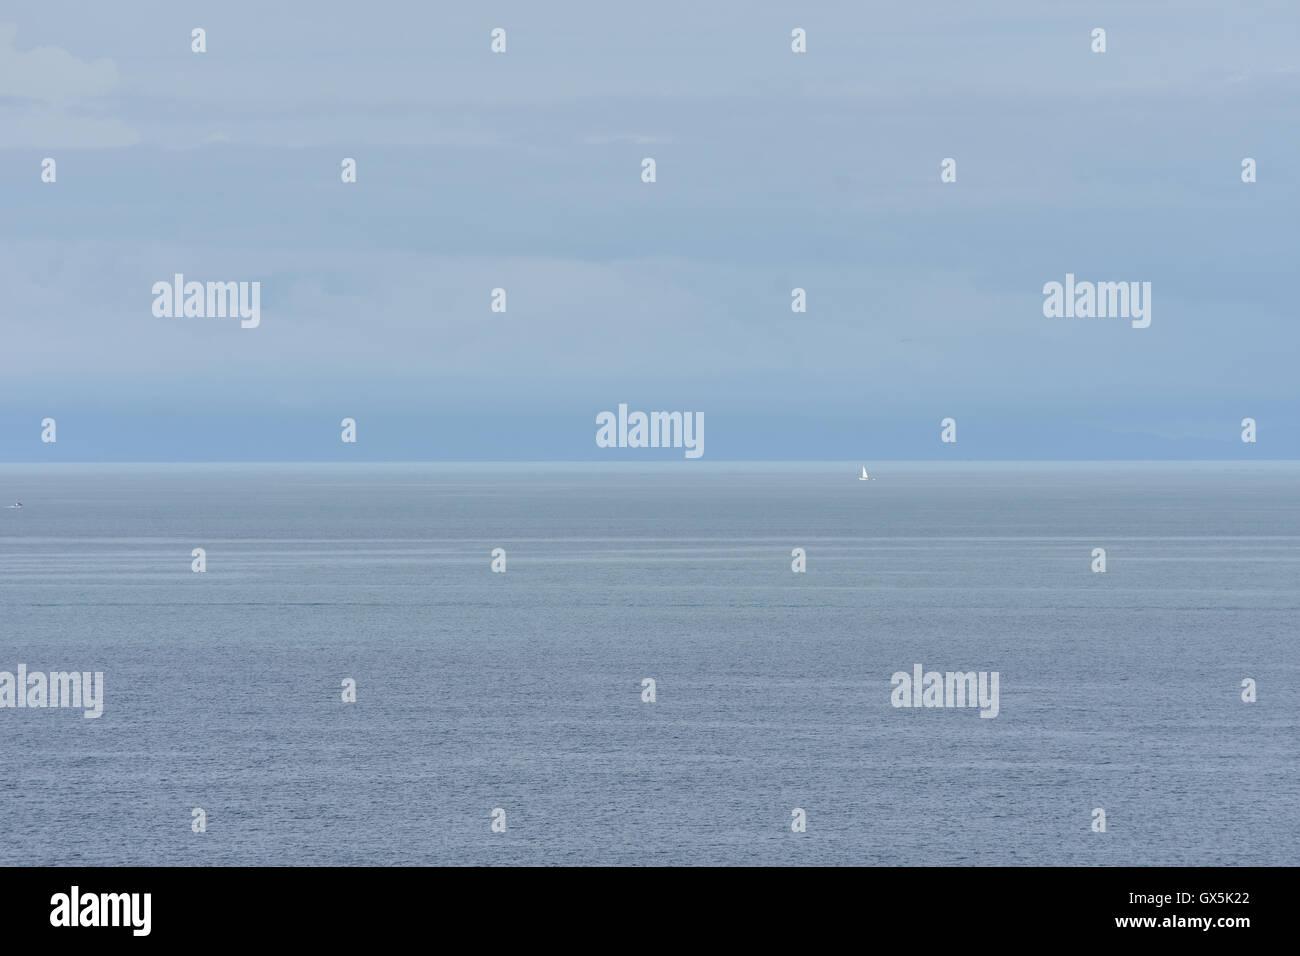 Miniscule sailship on the horizon - Stock Image